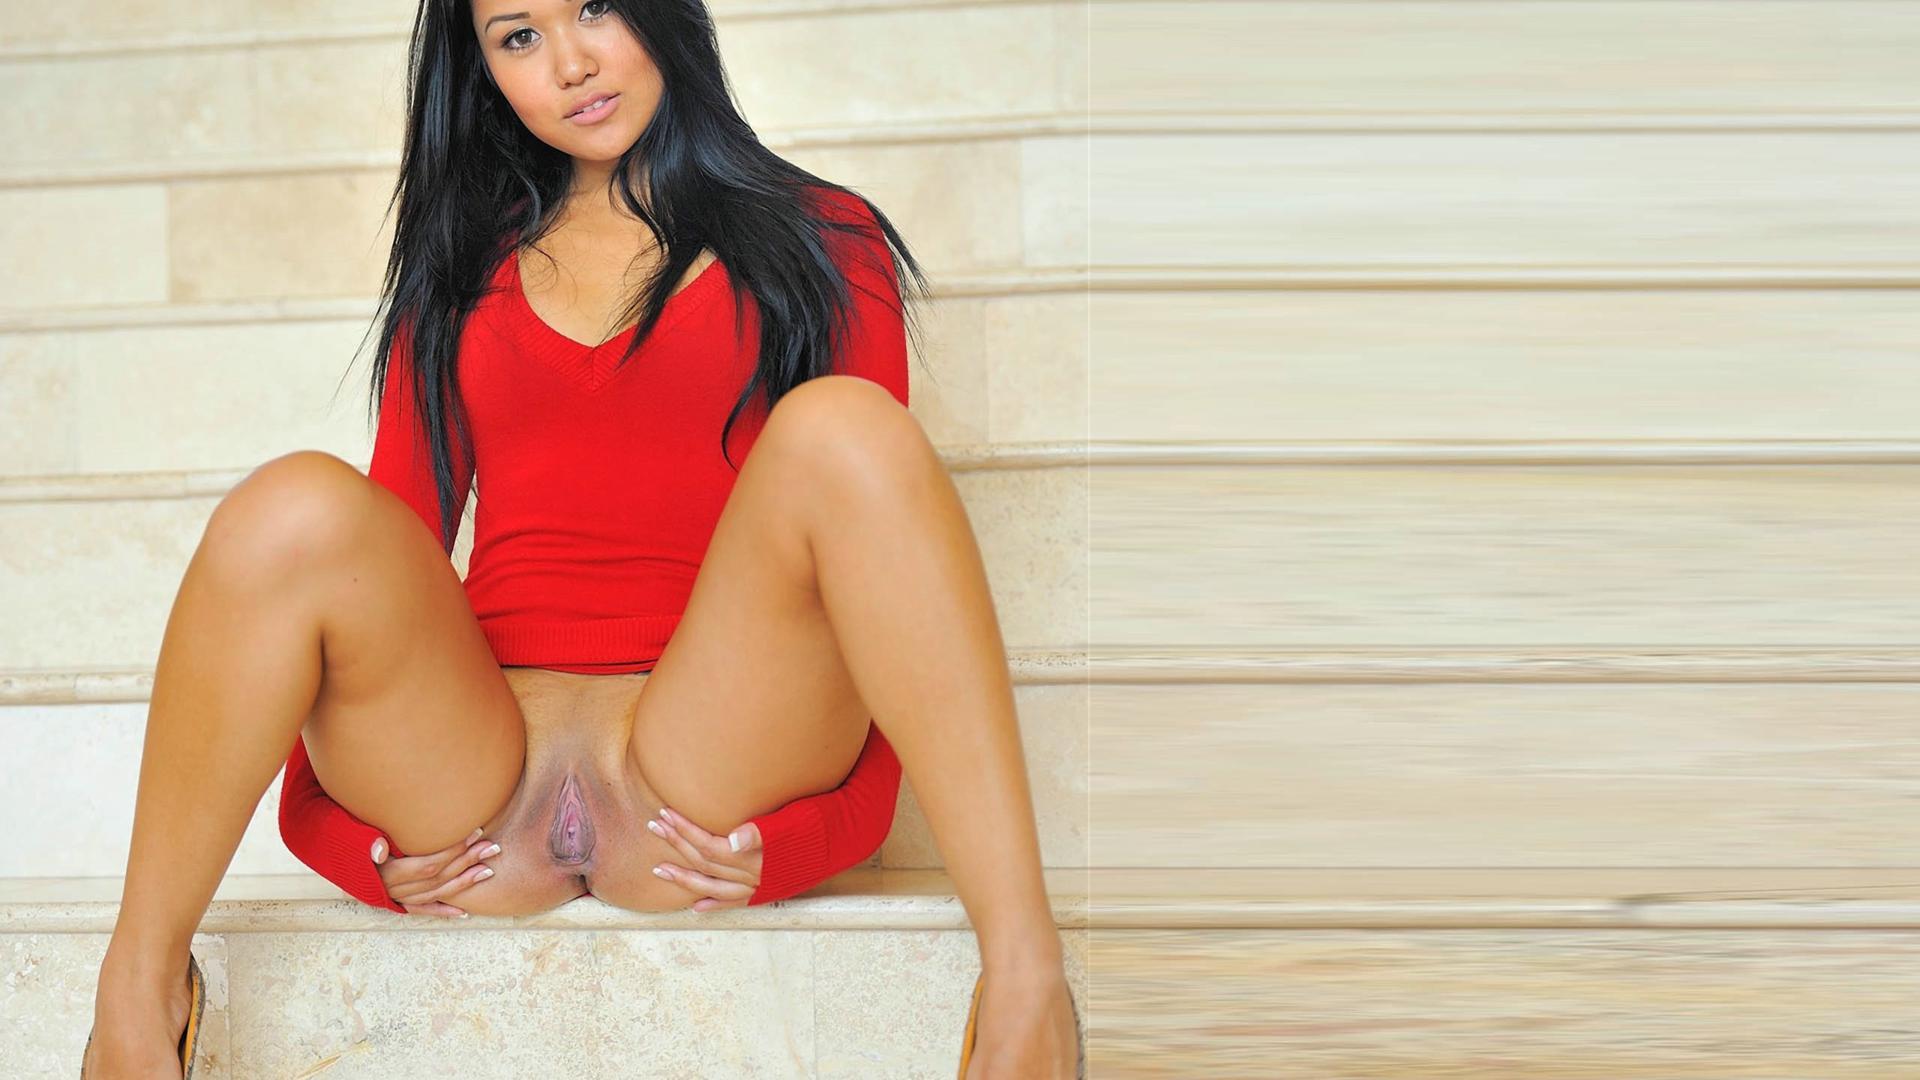 Beautiful girl in red stockings brings her pu 5